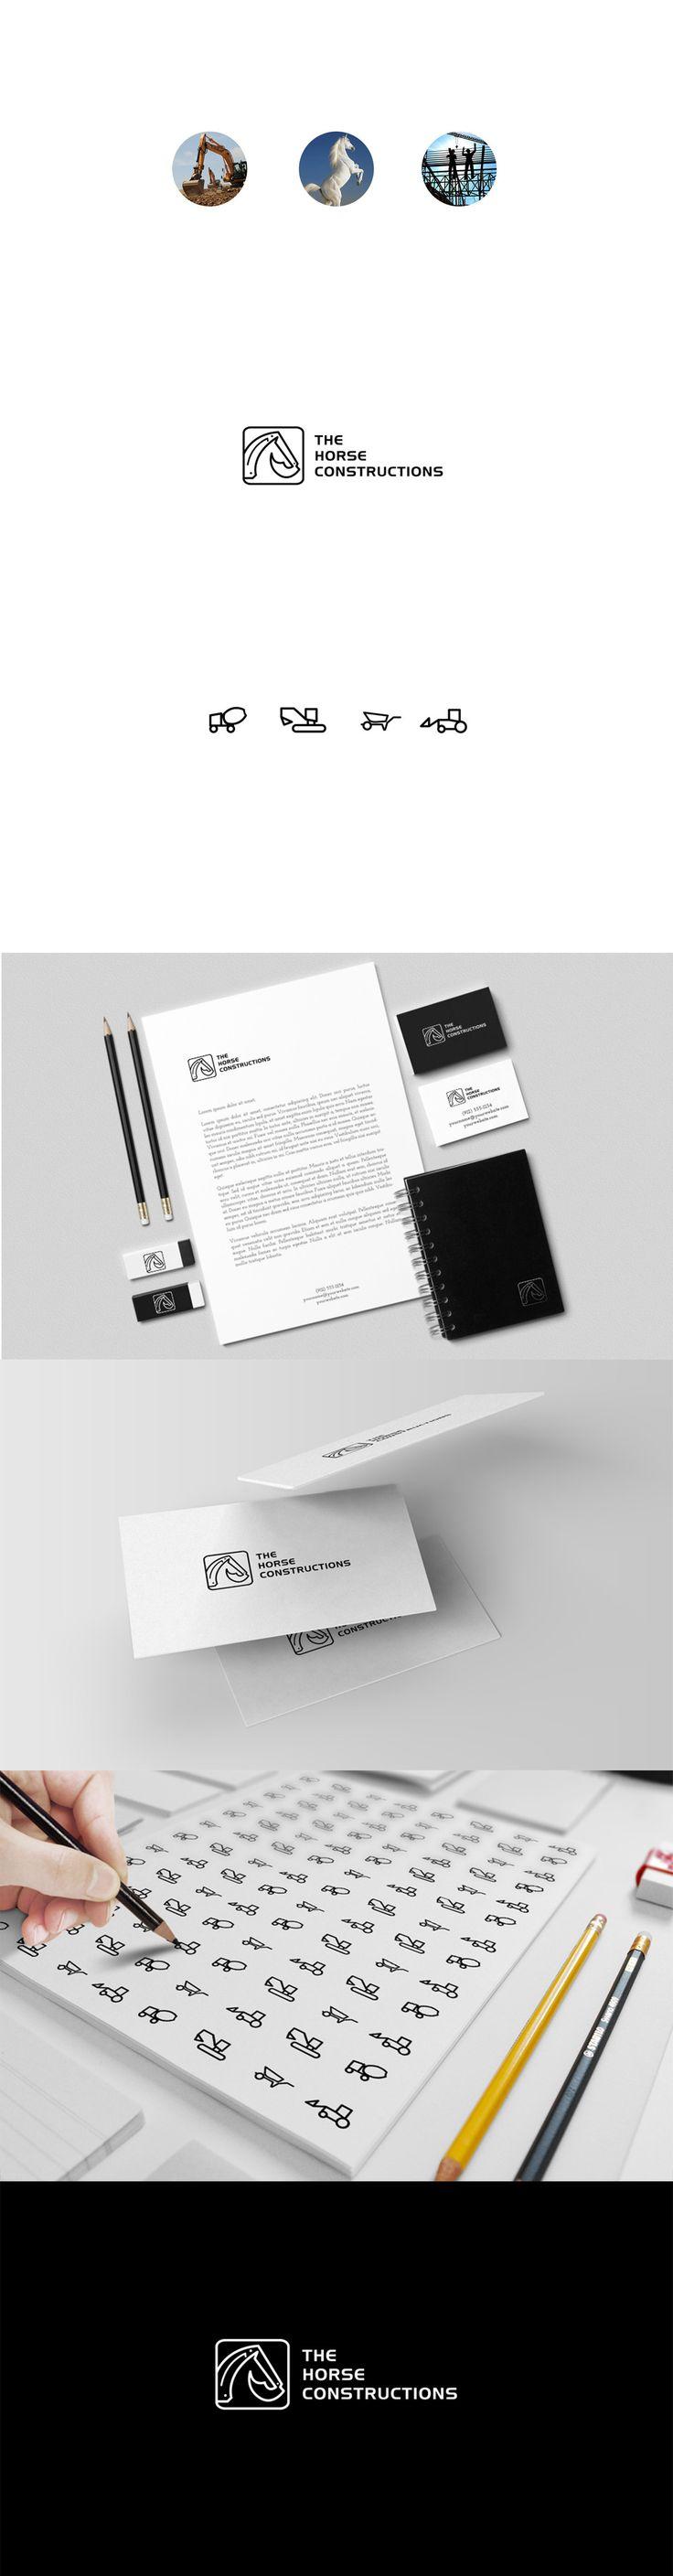 Construction Company Identiity Designs: 17 Inspirational Projects iBrandStudio